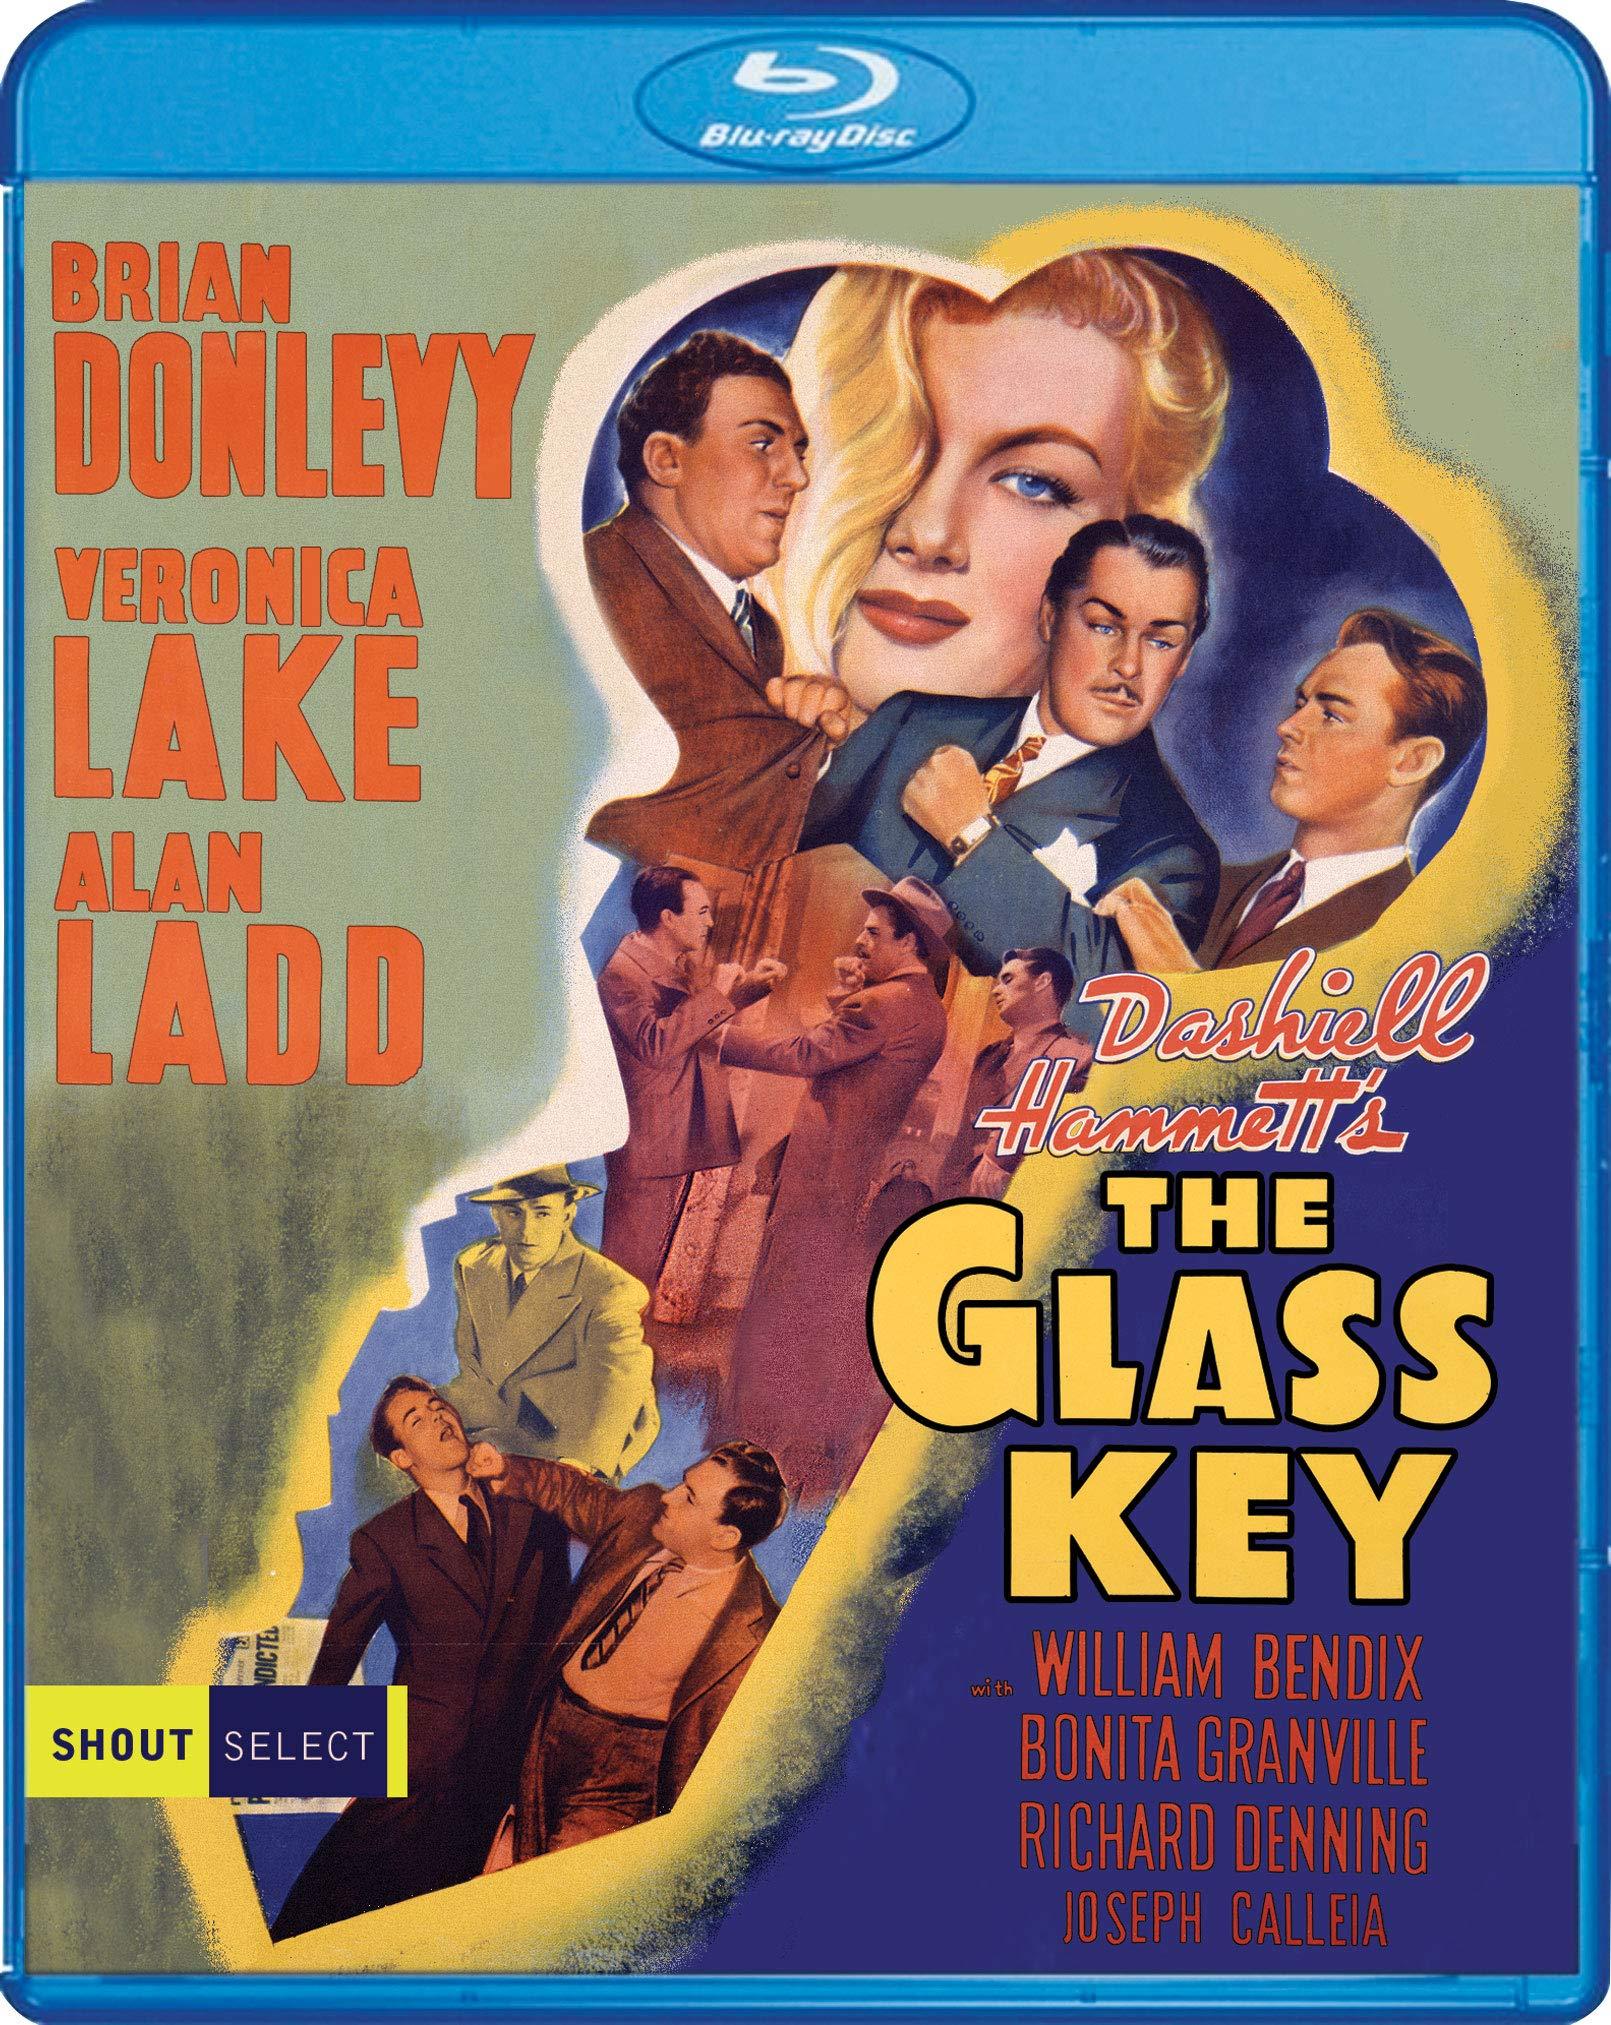 Blu-ray : The Glass Key (Widescreen)